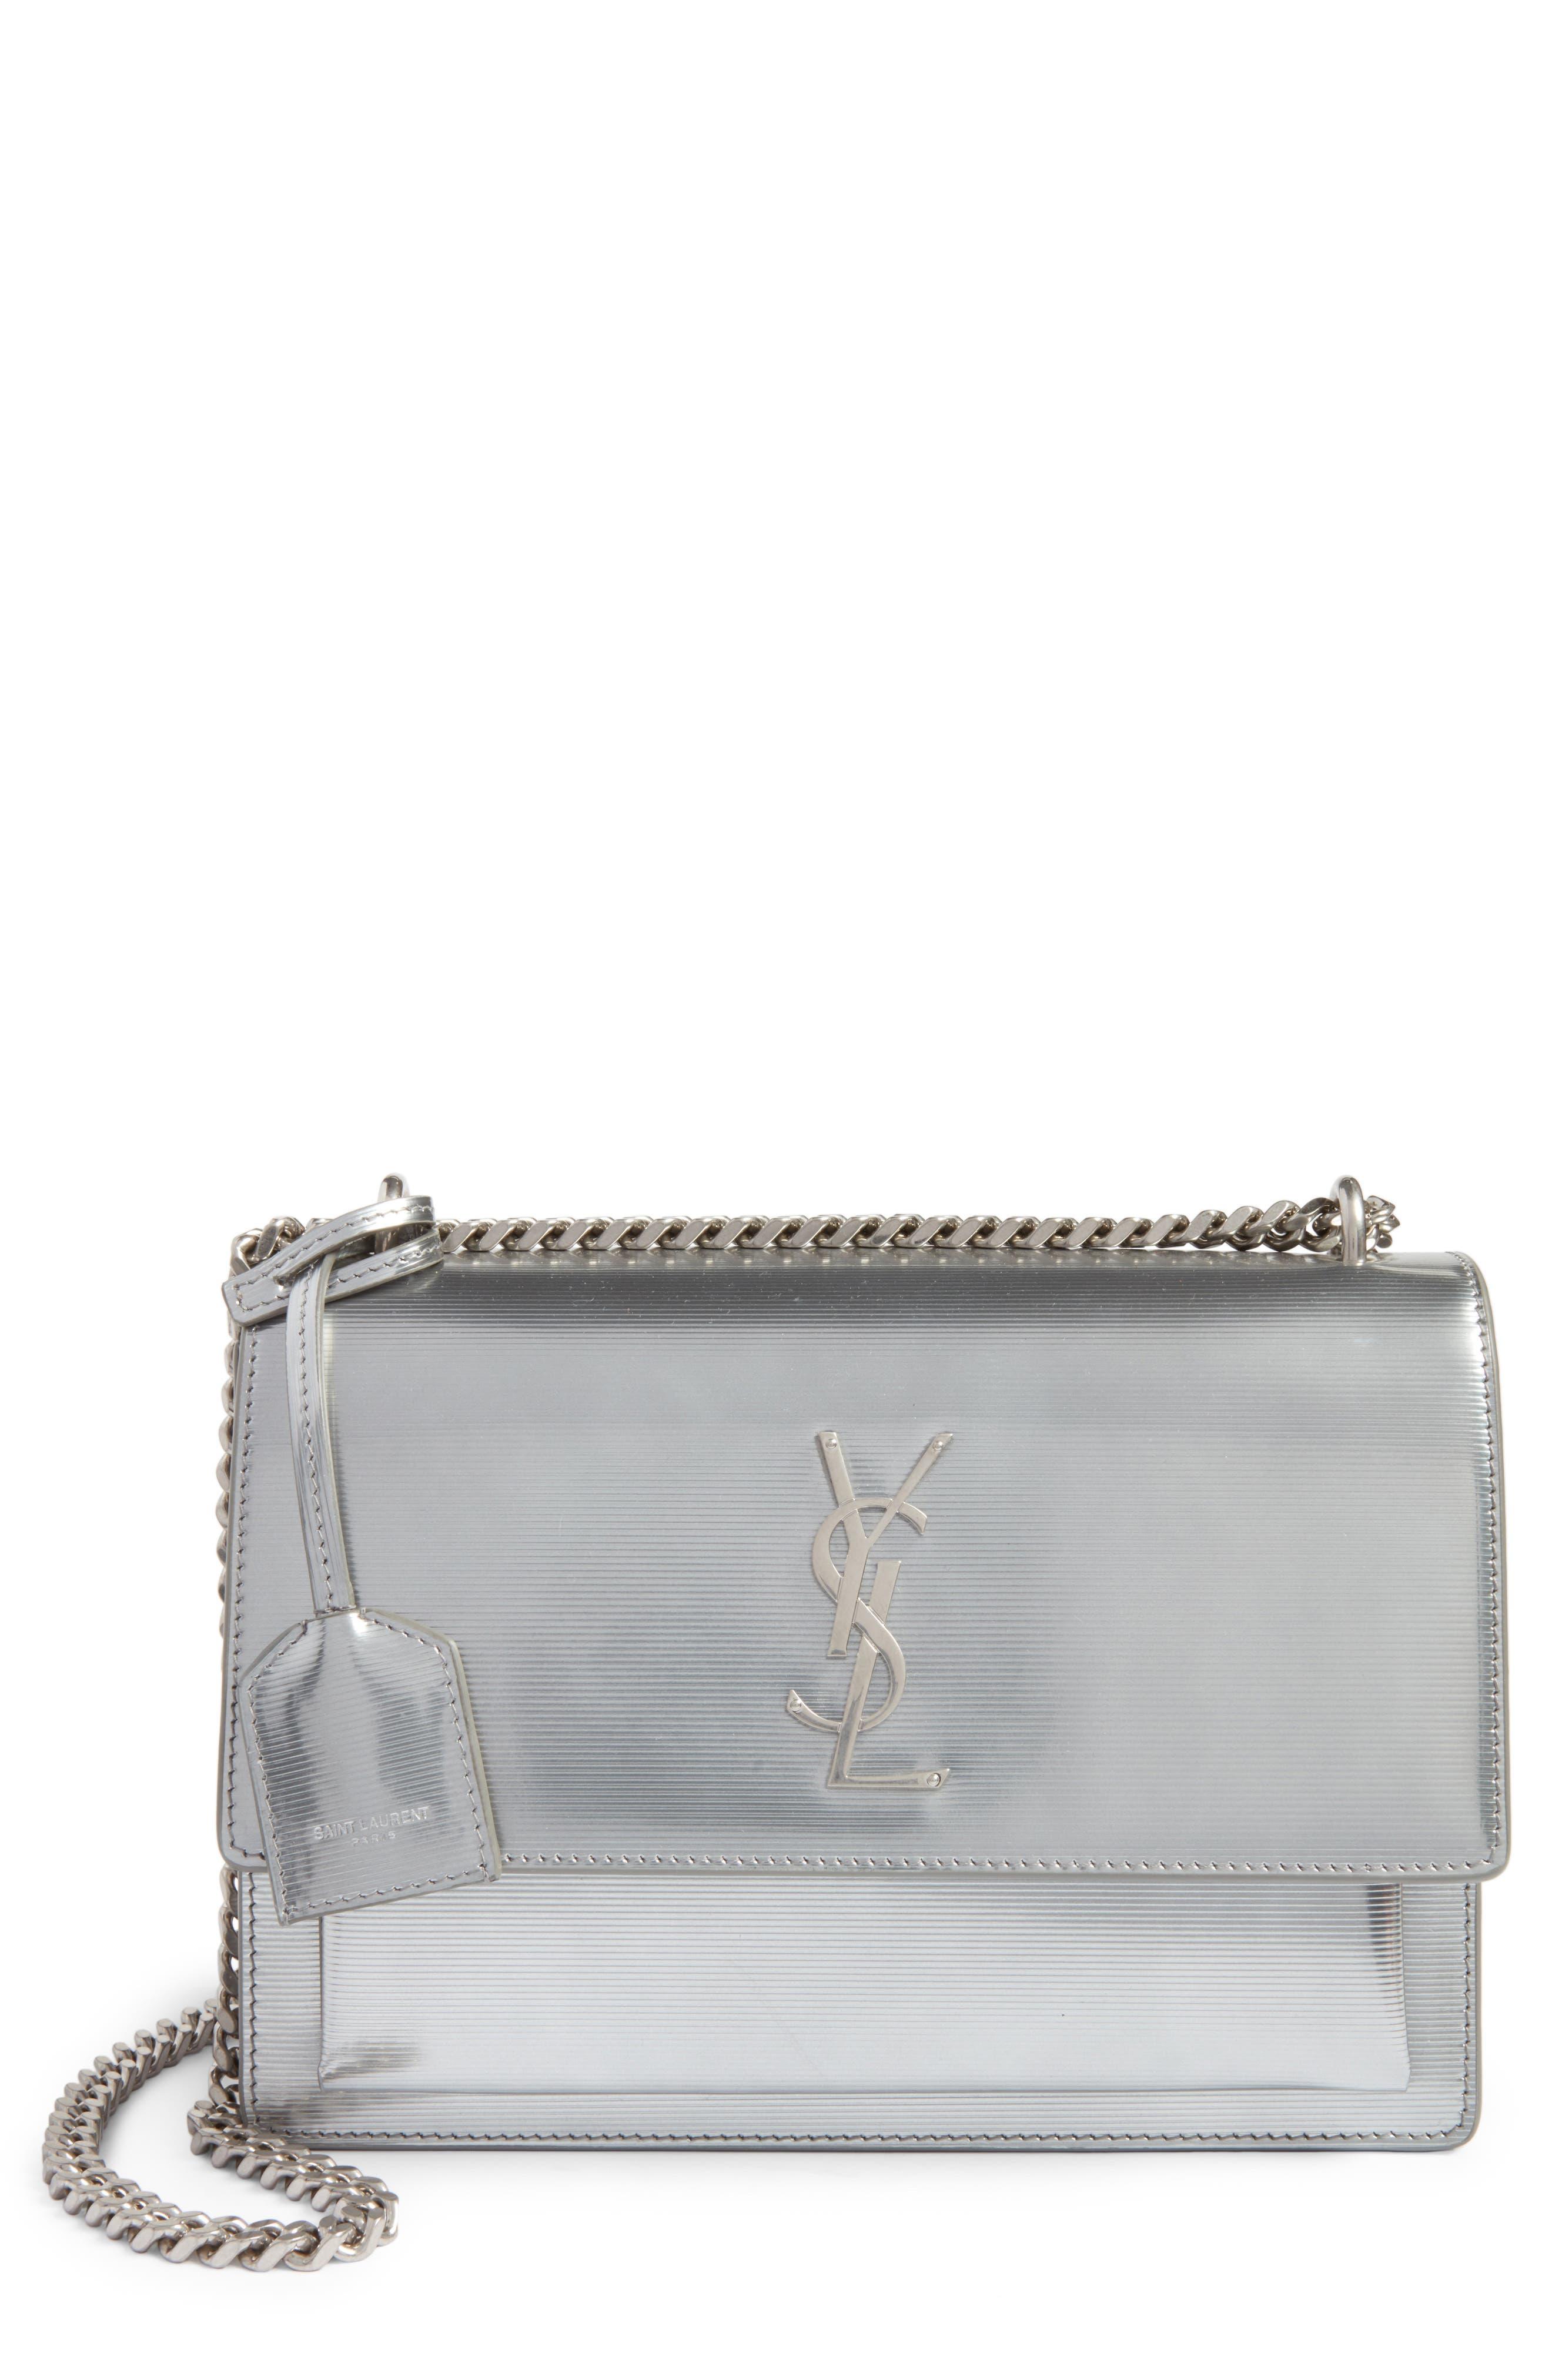 Medium Sunset Opium Leather Crossbody Bag,                             Main thumbnail 1, color,                             Dark Silver